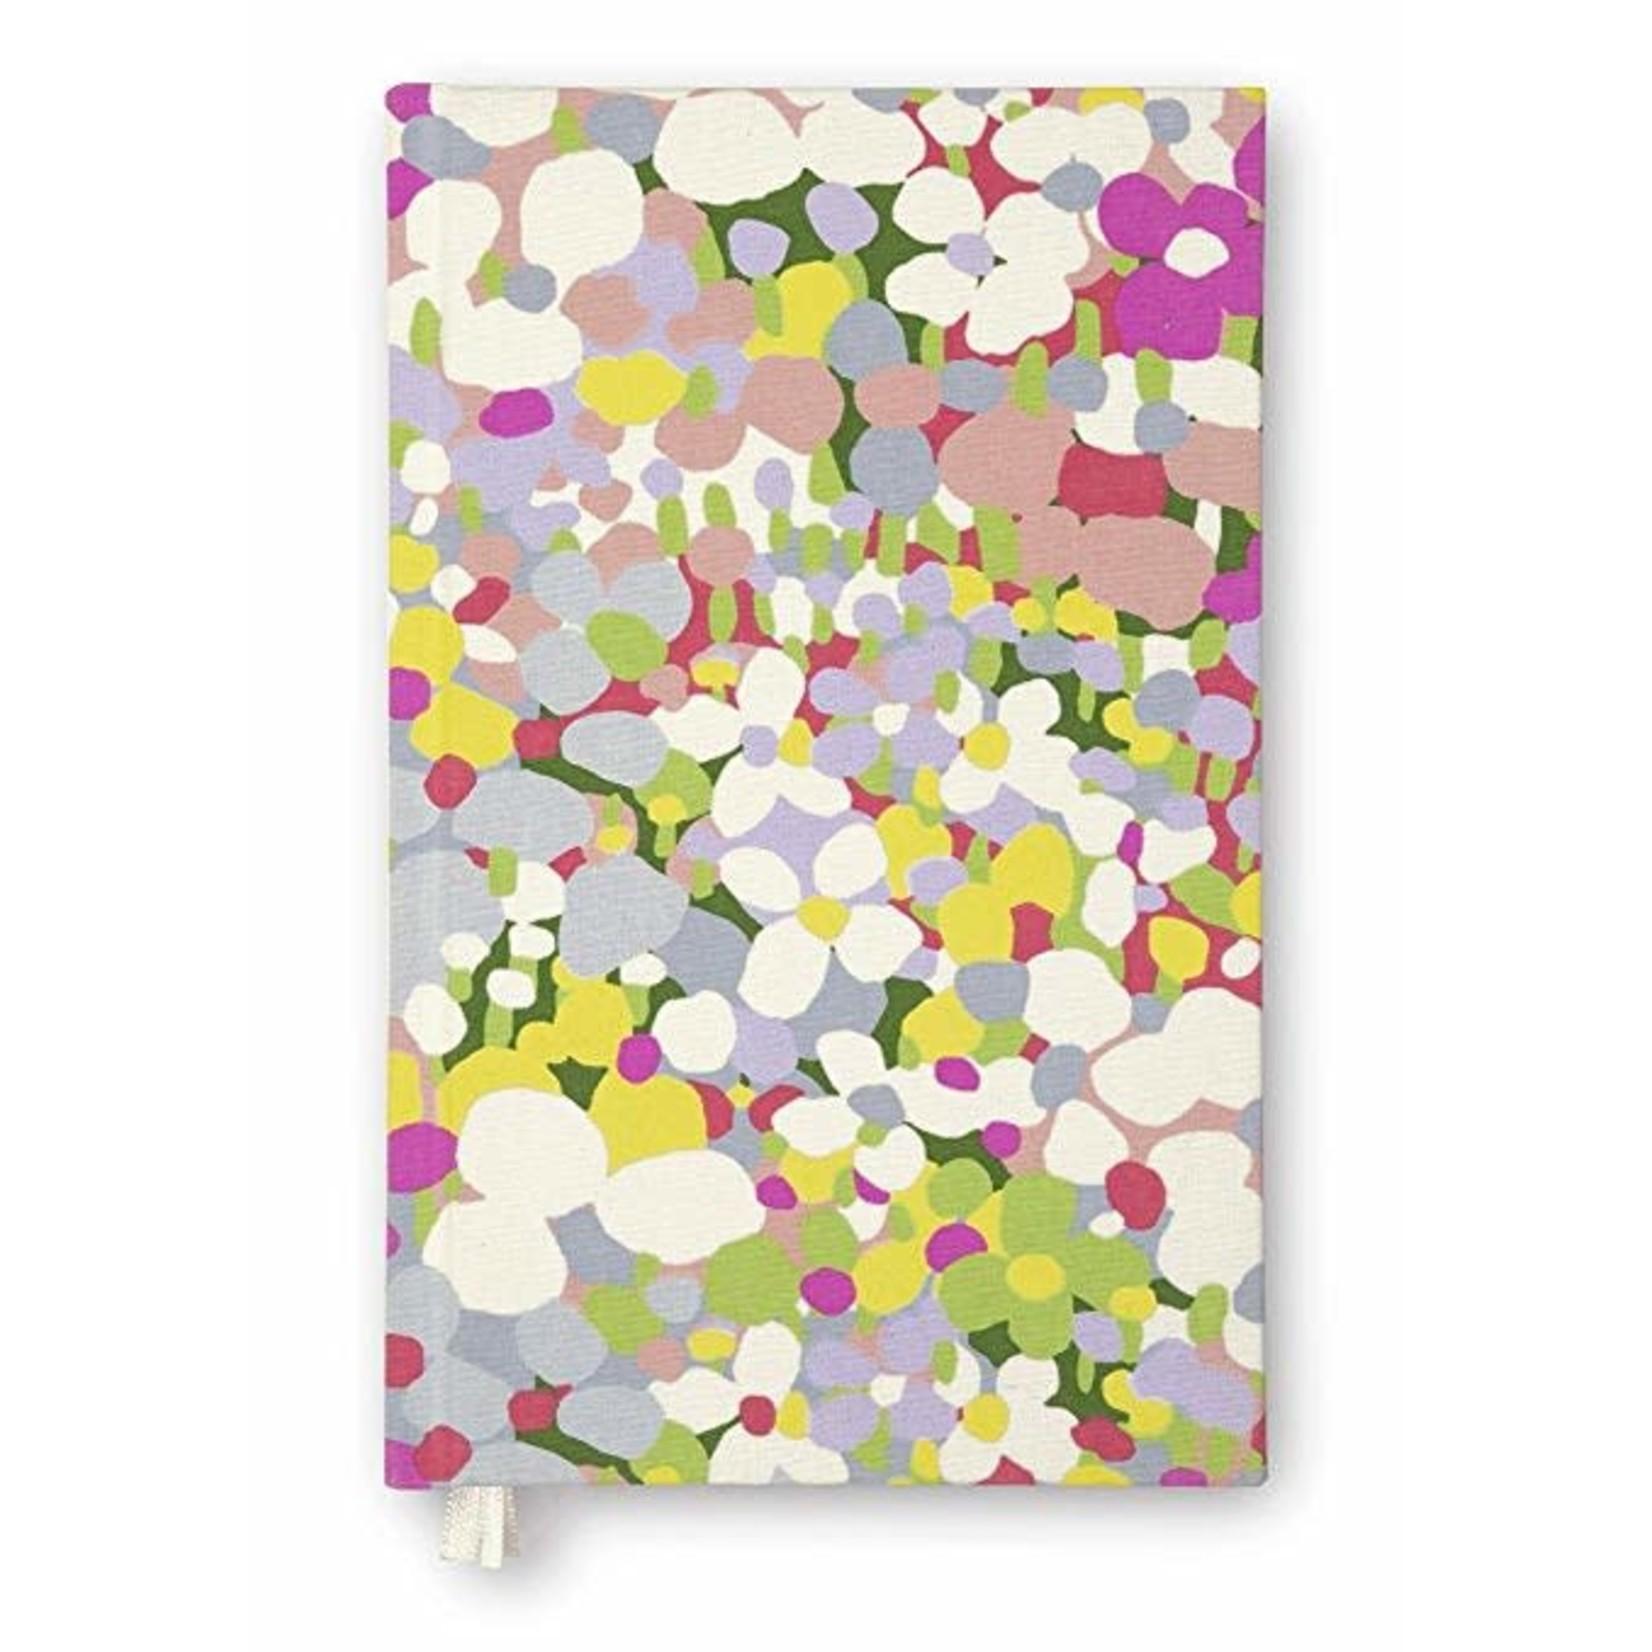 Kate Spade Cahier de notes floral